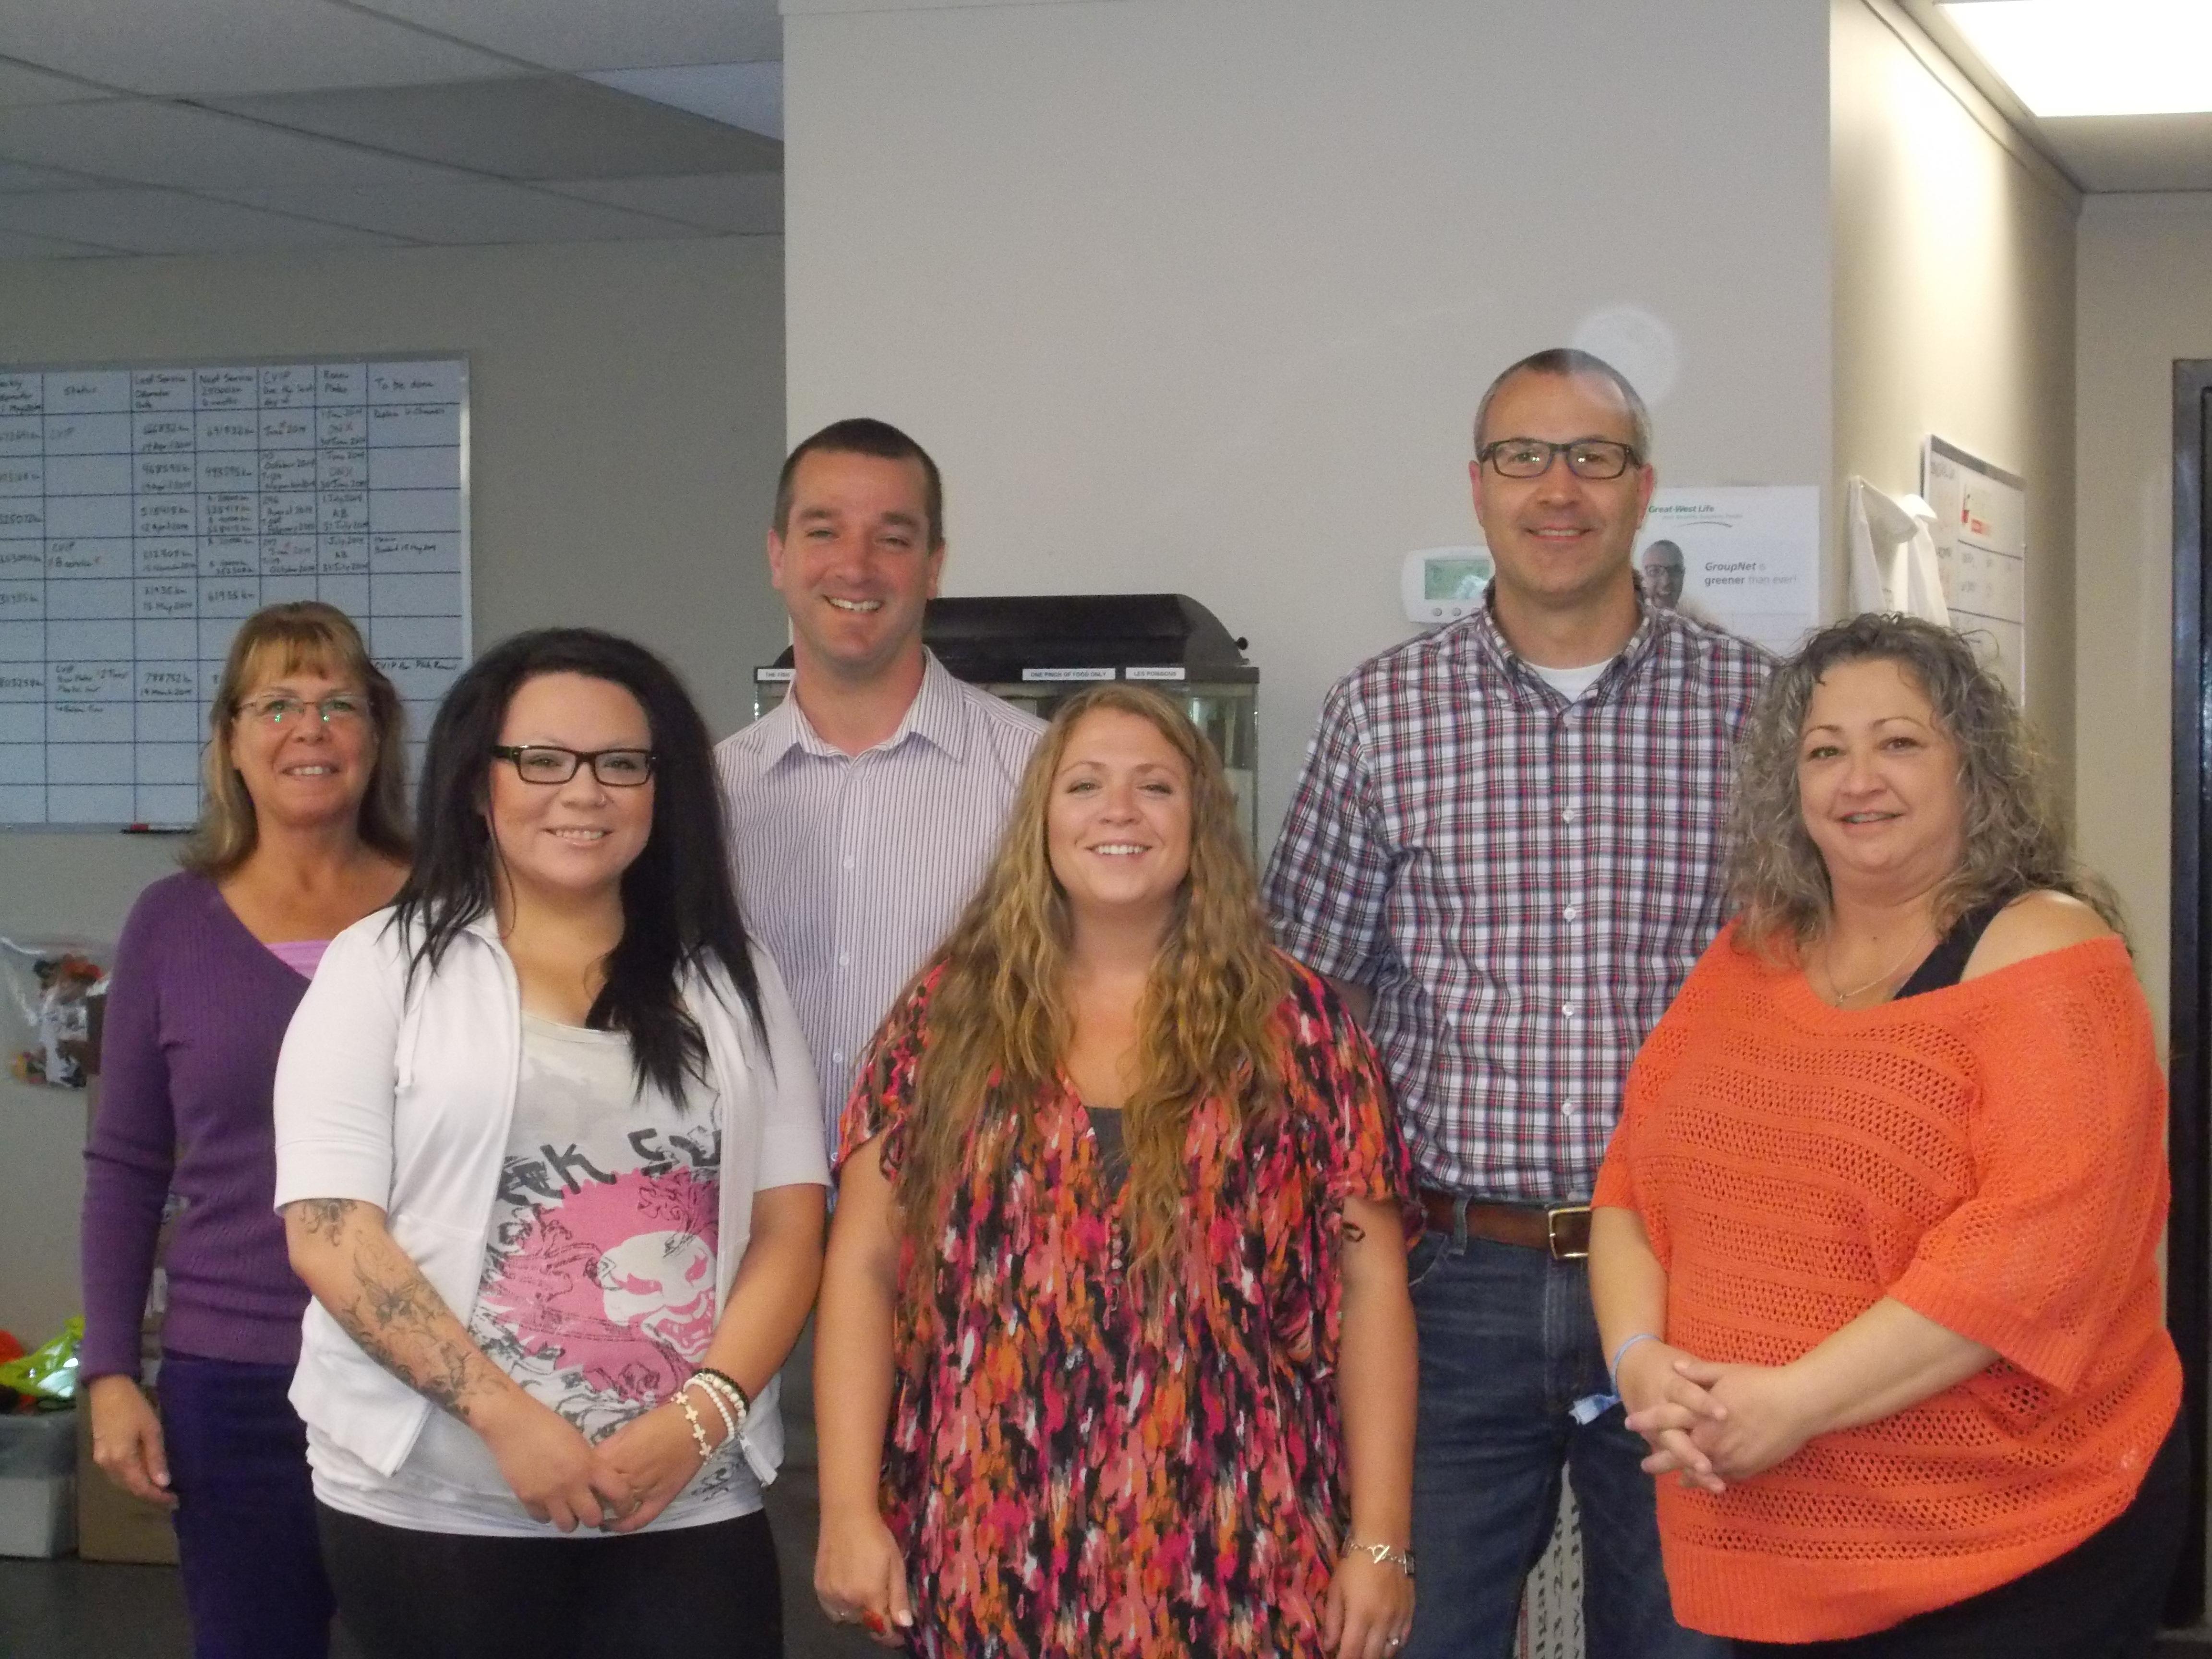 Calgary Office Team 05292014